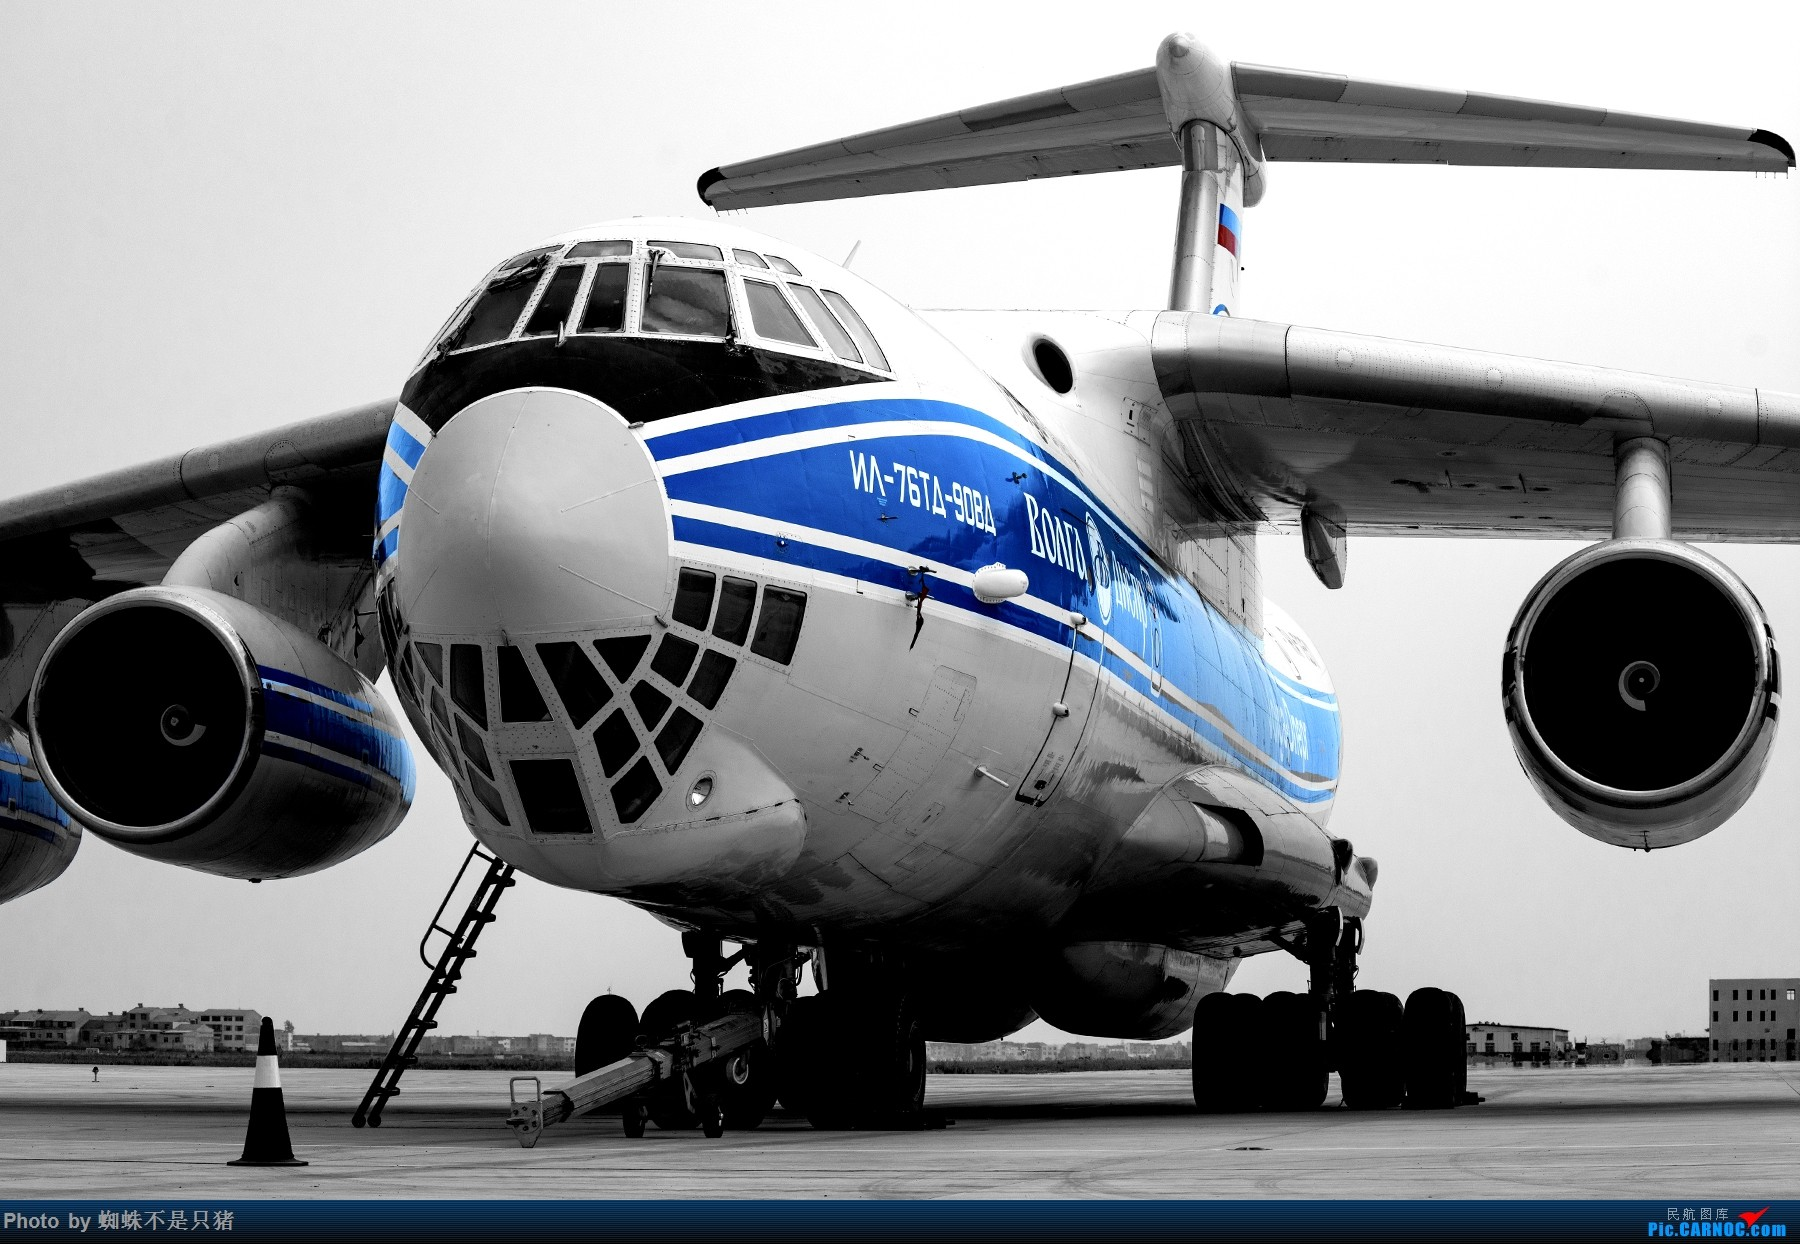 Re:[原创]襄阳机场首批国际航班 Volga-Dnepr的伊尔-76 ILYUSHIN IL-76 RA-76511 中国襄阳刘集机场